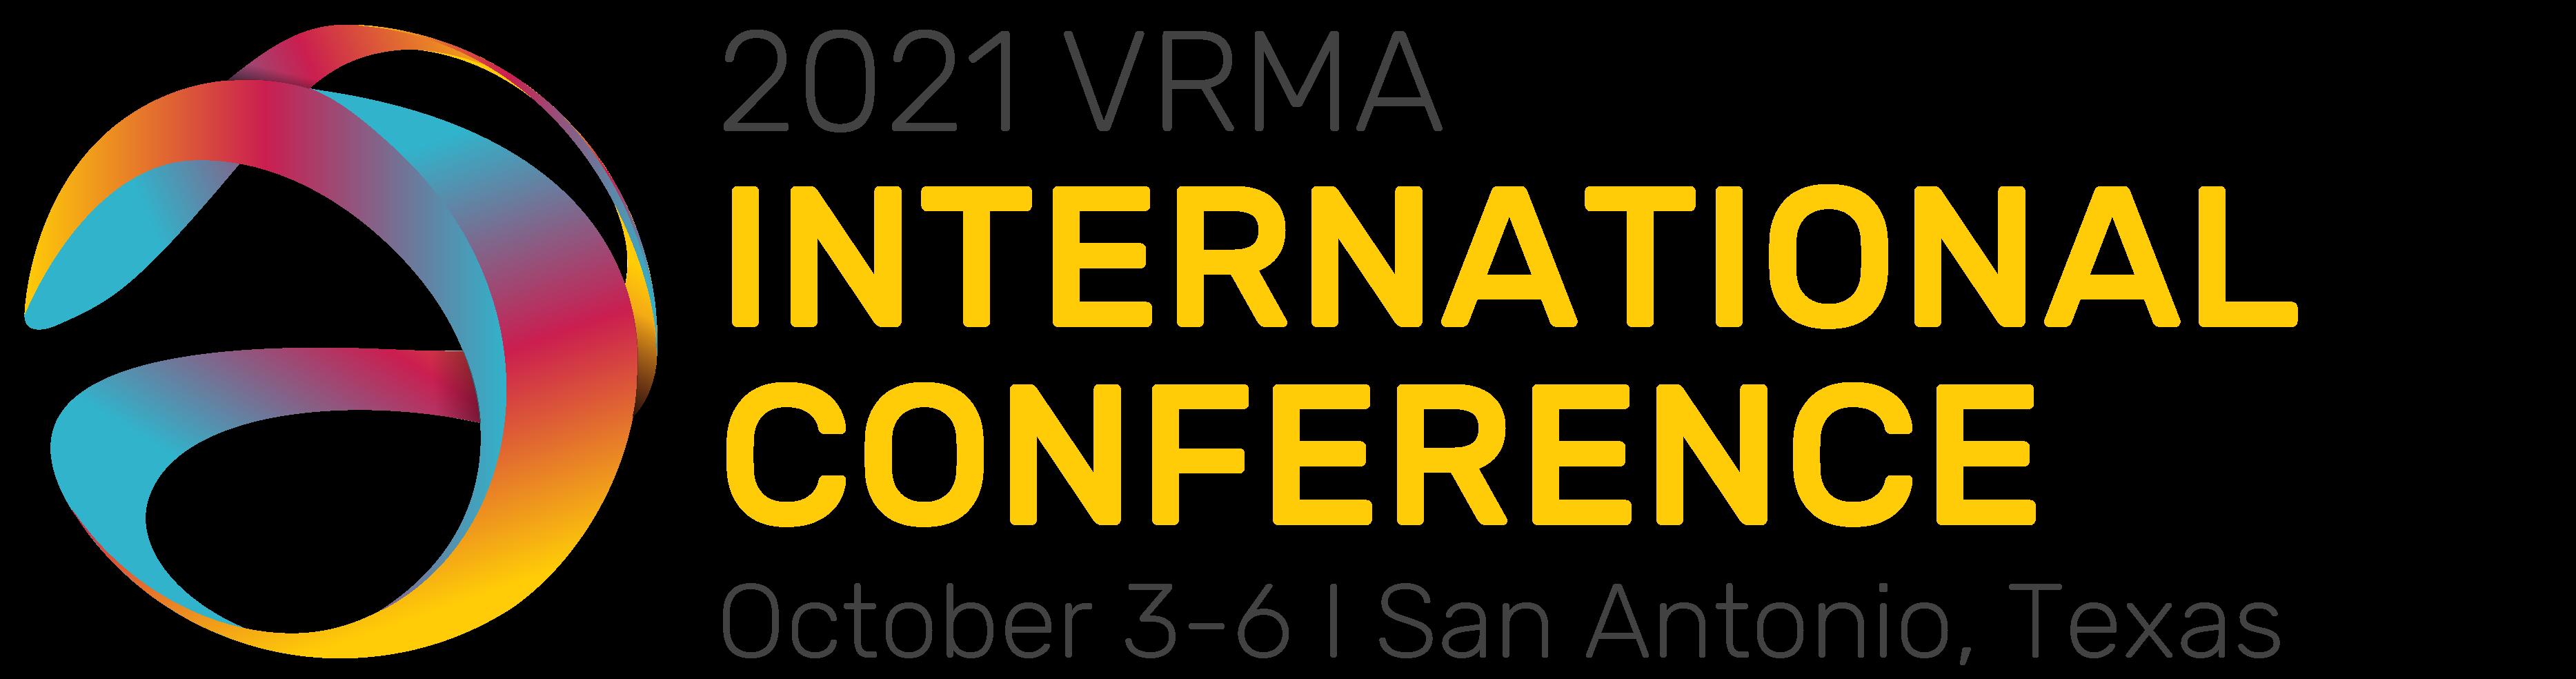 2021 VRMA International Conference